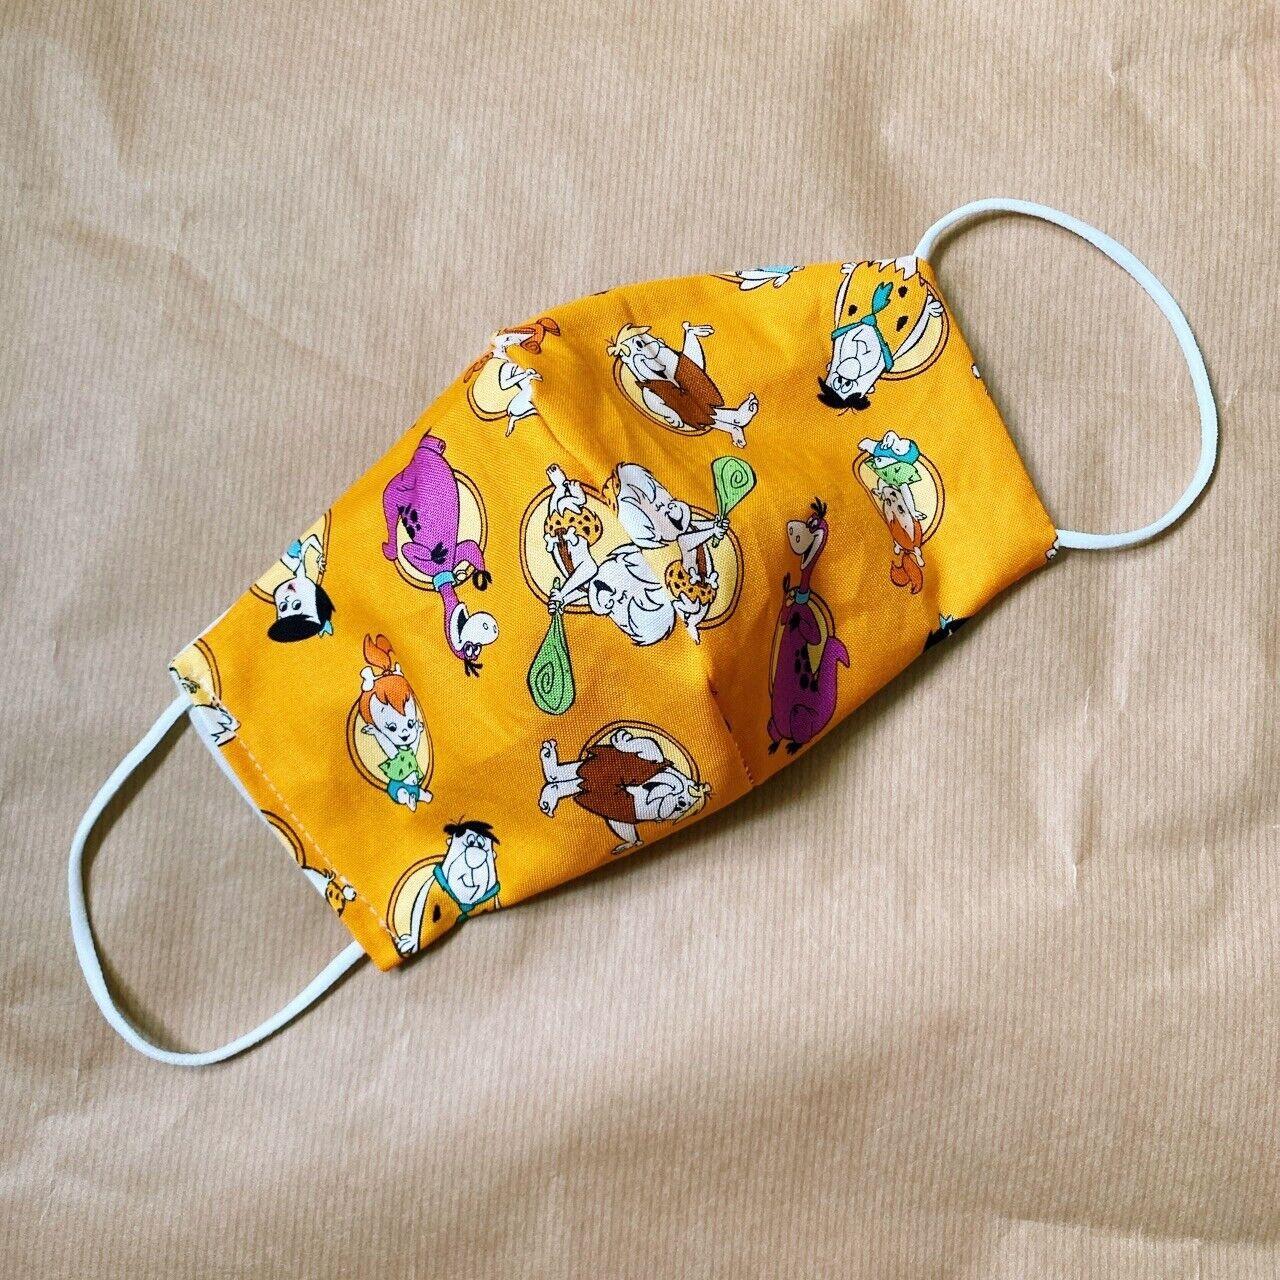 ☁️ Handmade Retro Orange Flintstones 100% Cotton Mask 🦕 🧉🐚